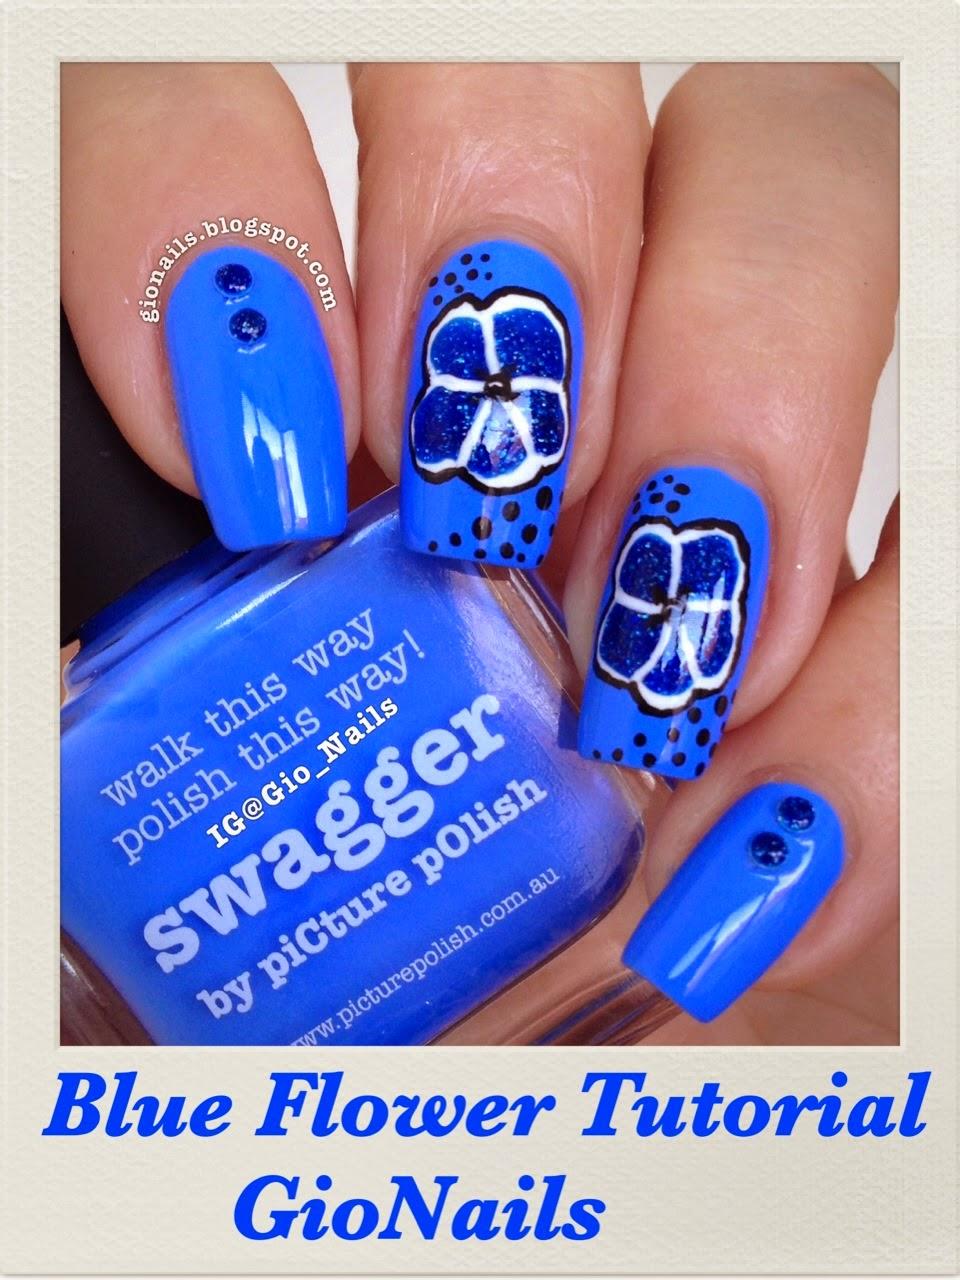 http://gionails.blogspot.be/2014/06/blue-flower-tutorial.html